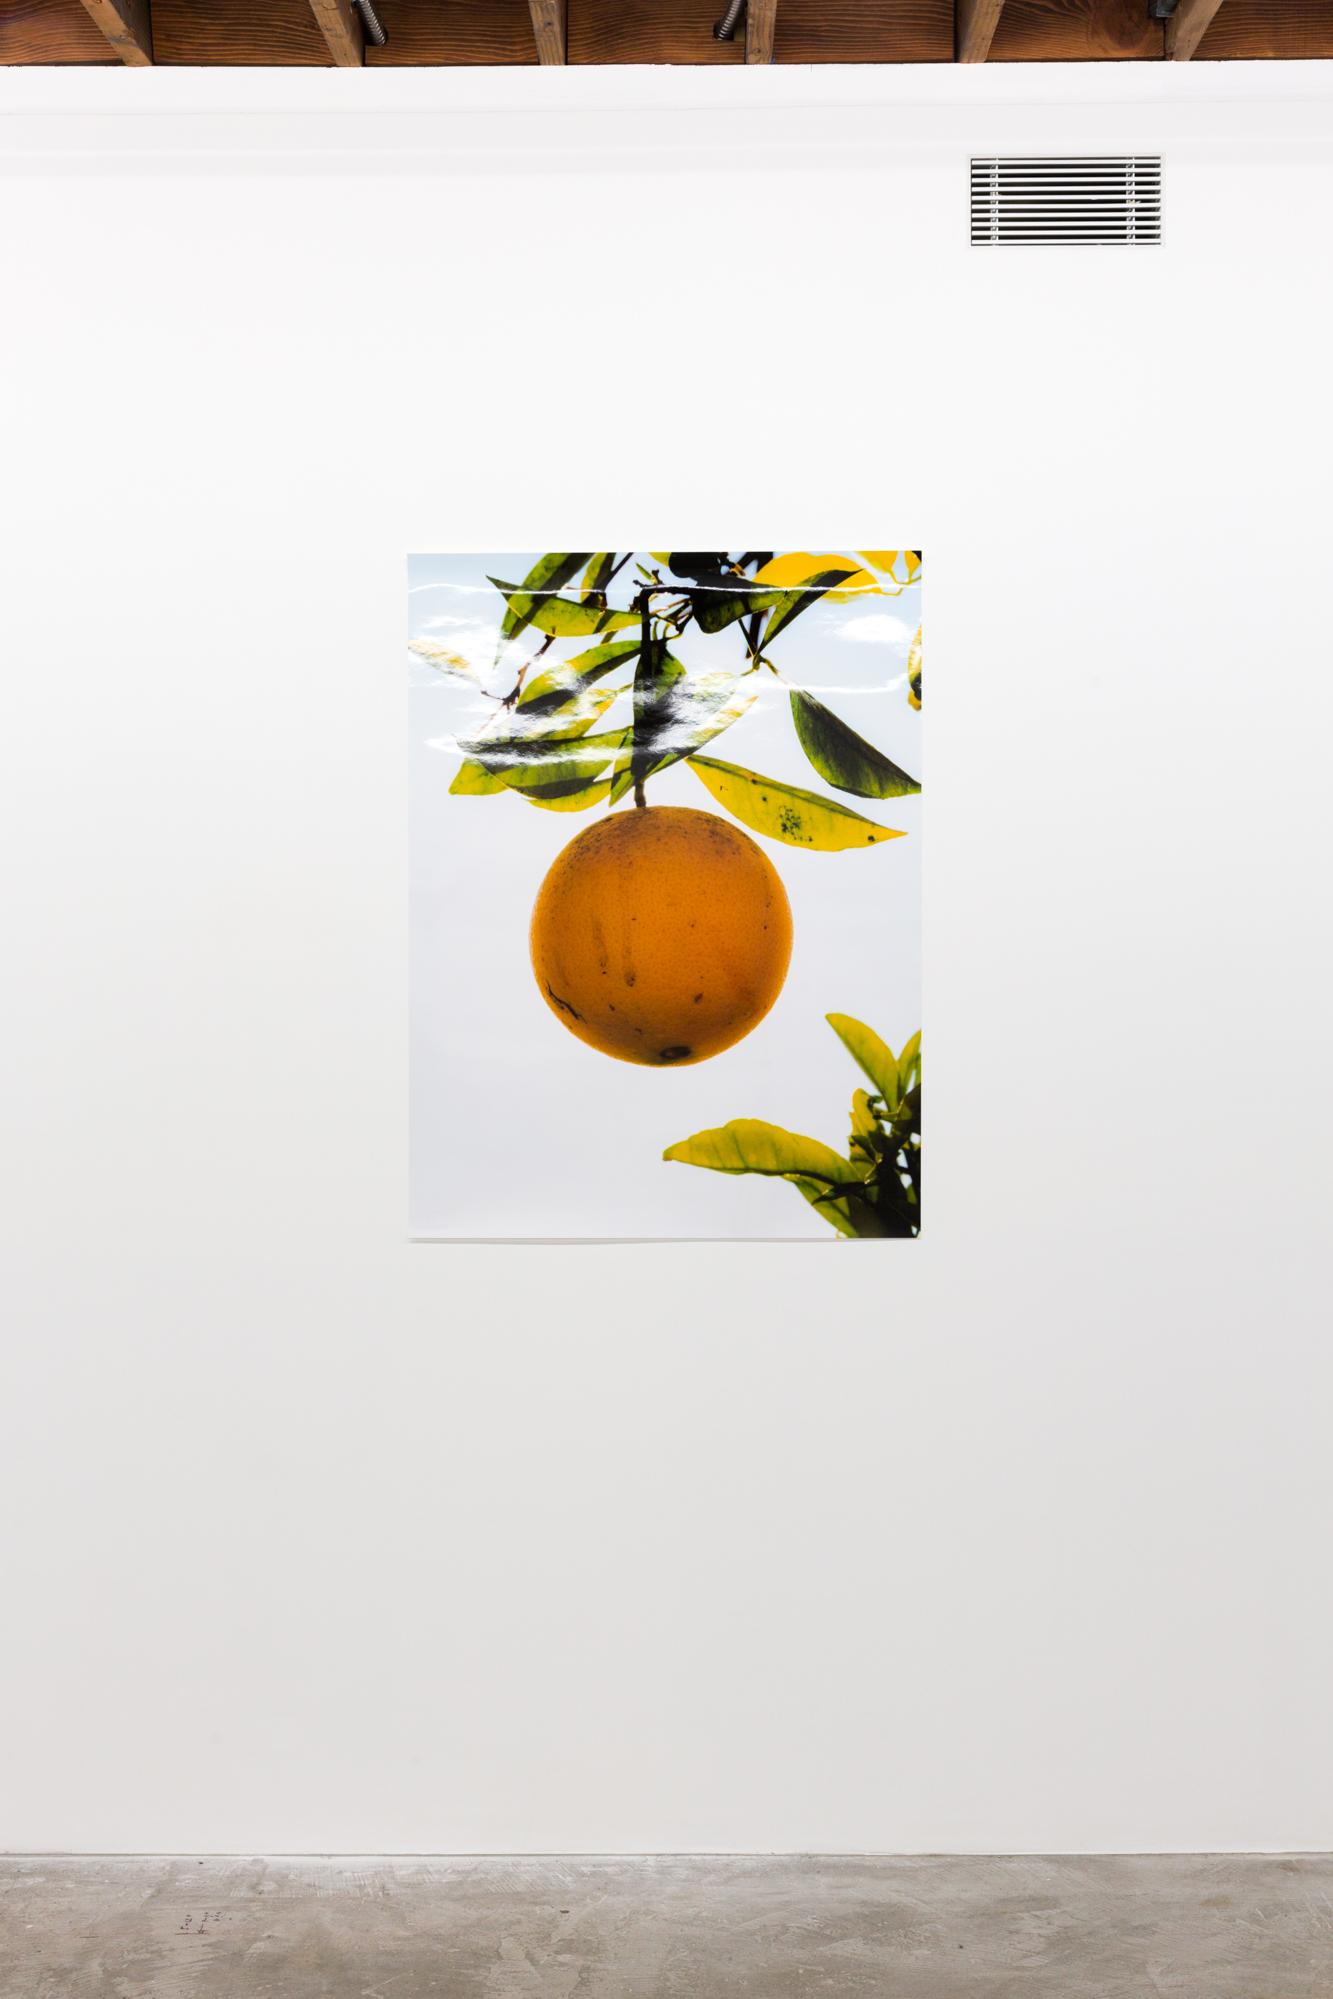 Orange II, December 31, 2017, Huntington Beach, CA , 2018, Chromira print, 40 x 30 inches